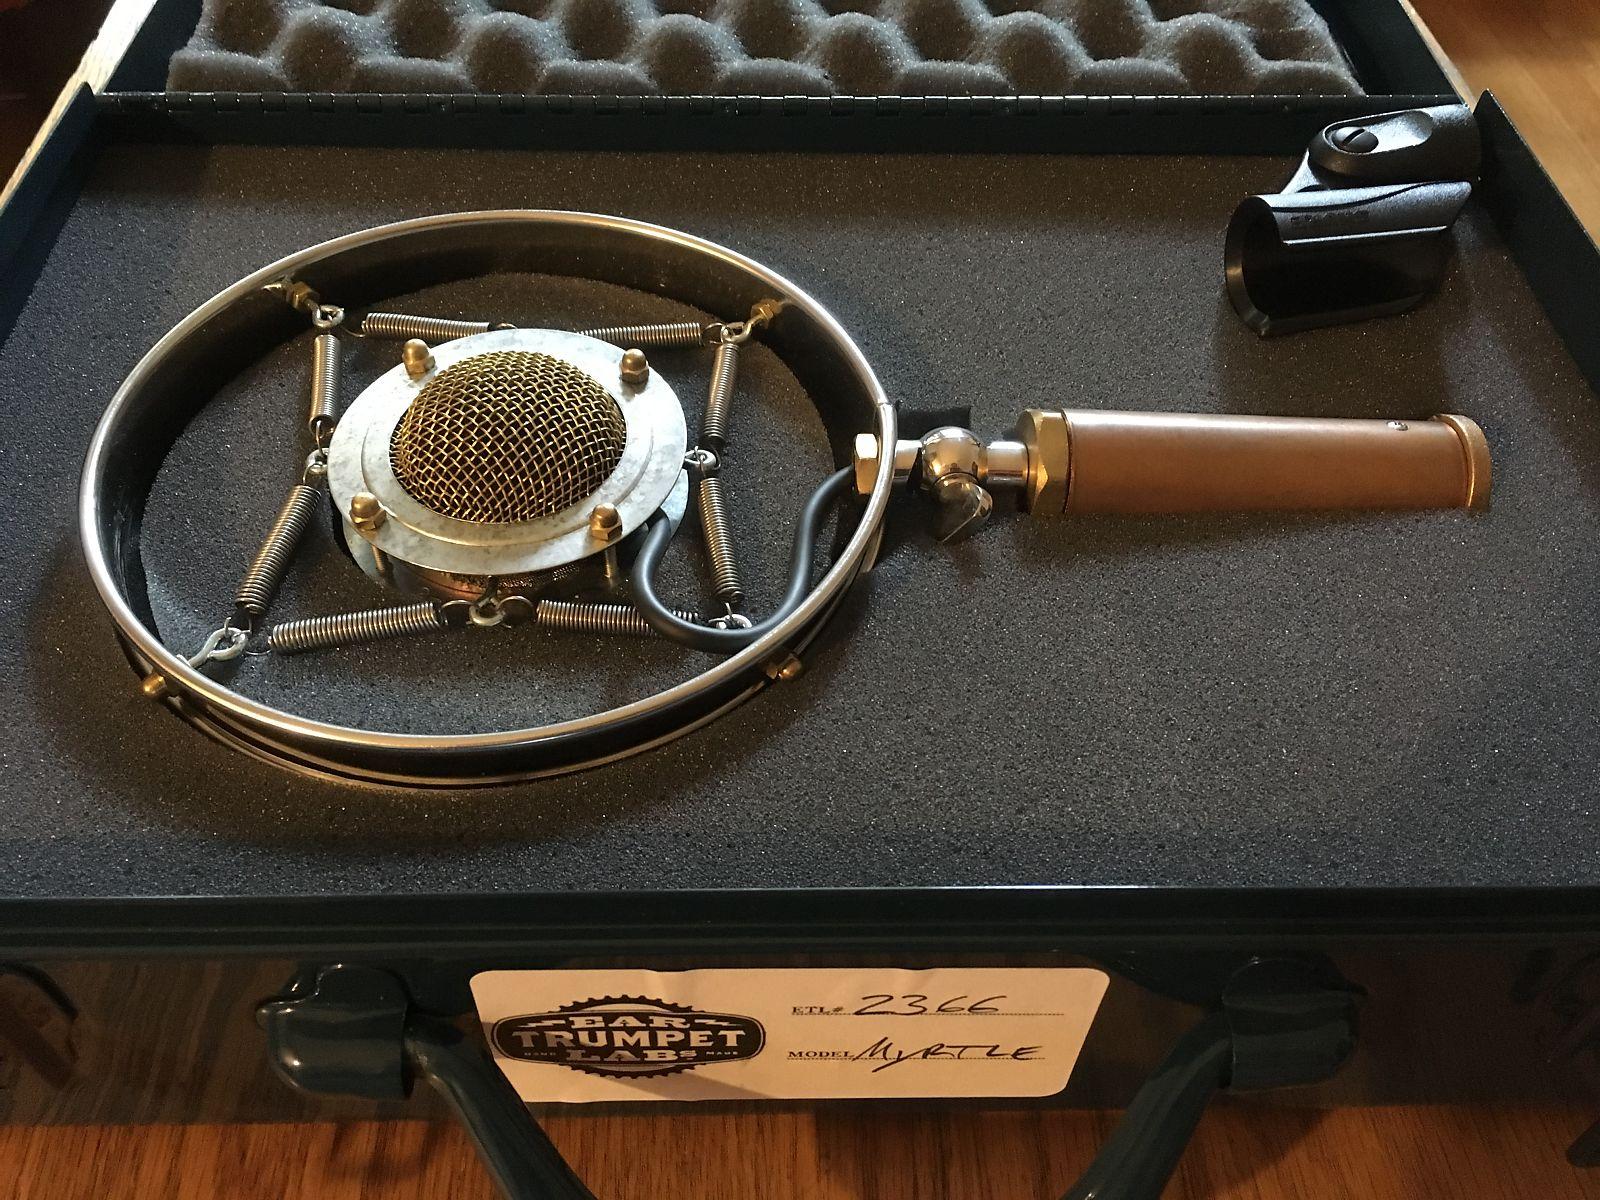 Ear Trumpet Labs Myrtle Large Diaphragm Cardioid Condenser Microphone |  Reverb